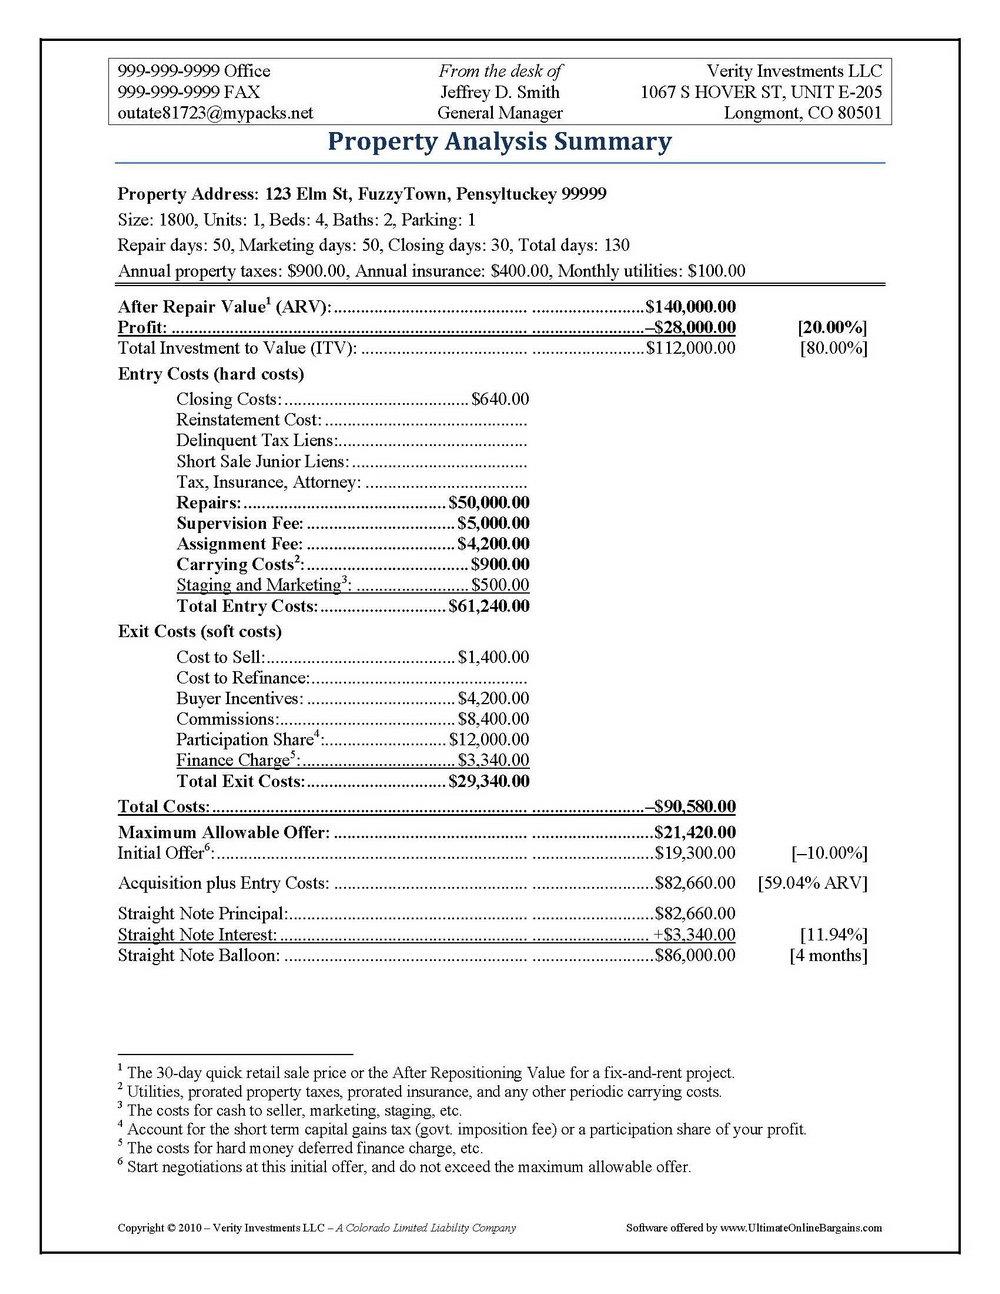 Real Estate Investment Analysis Worksheet